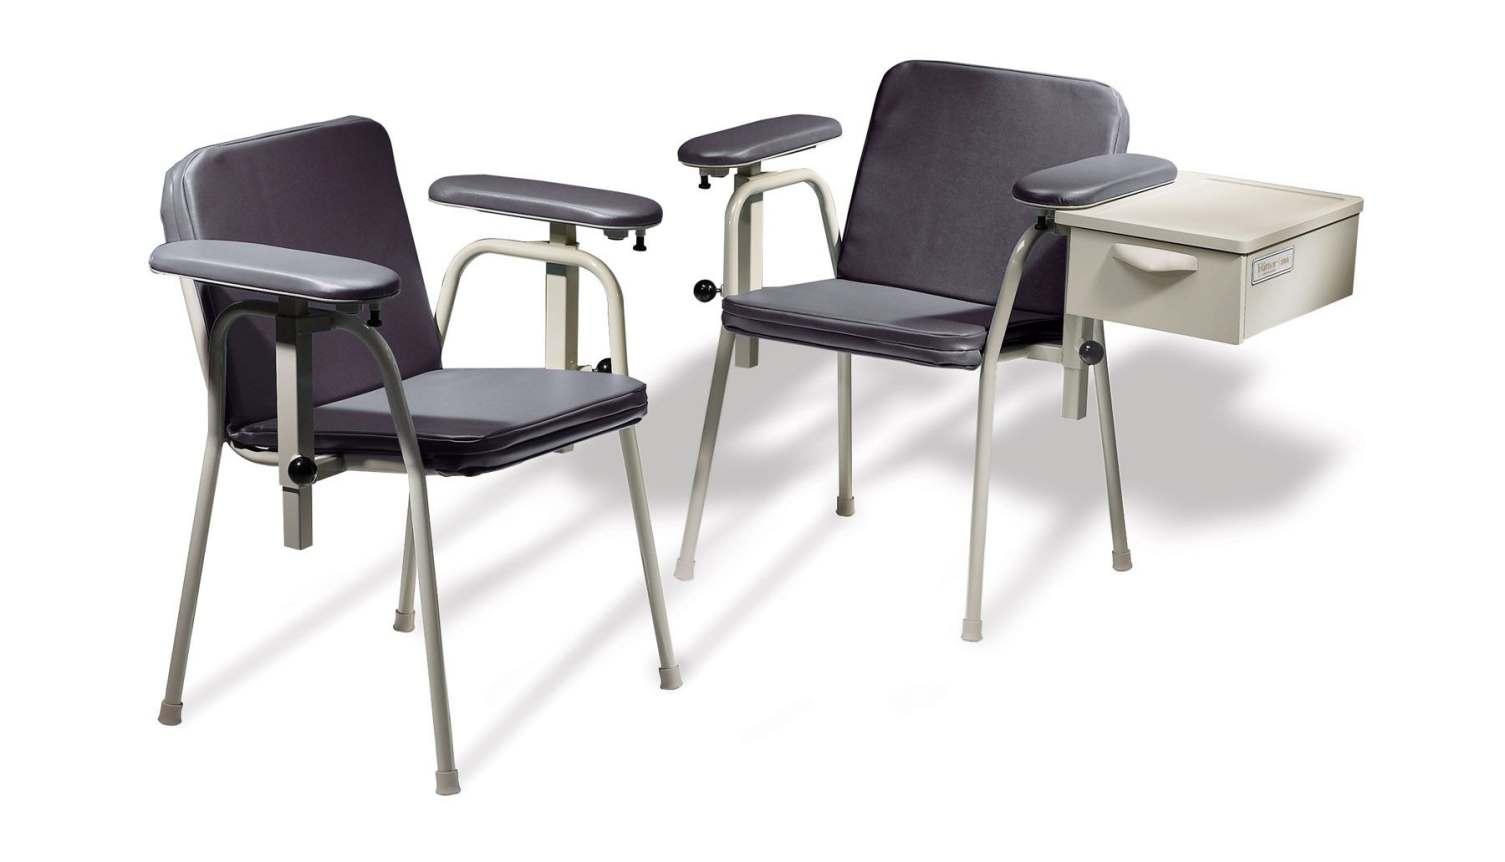 Midmark Blood Draw Chair - Blood Draw-Spruce, Each - Model 281-001-242